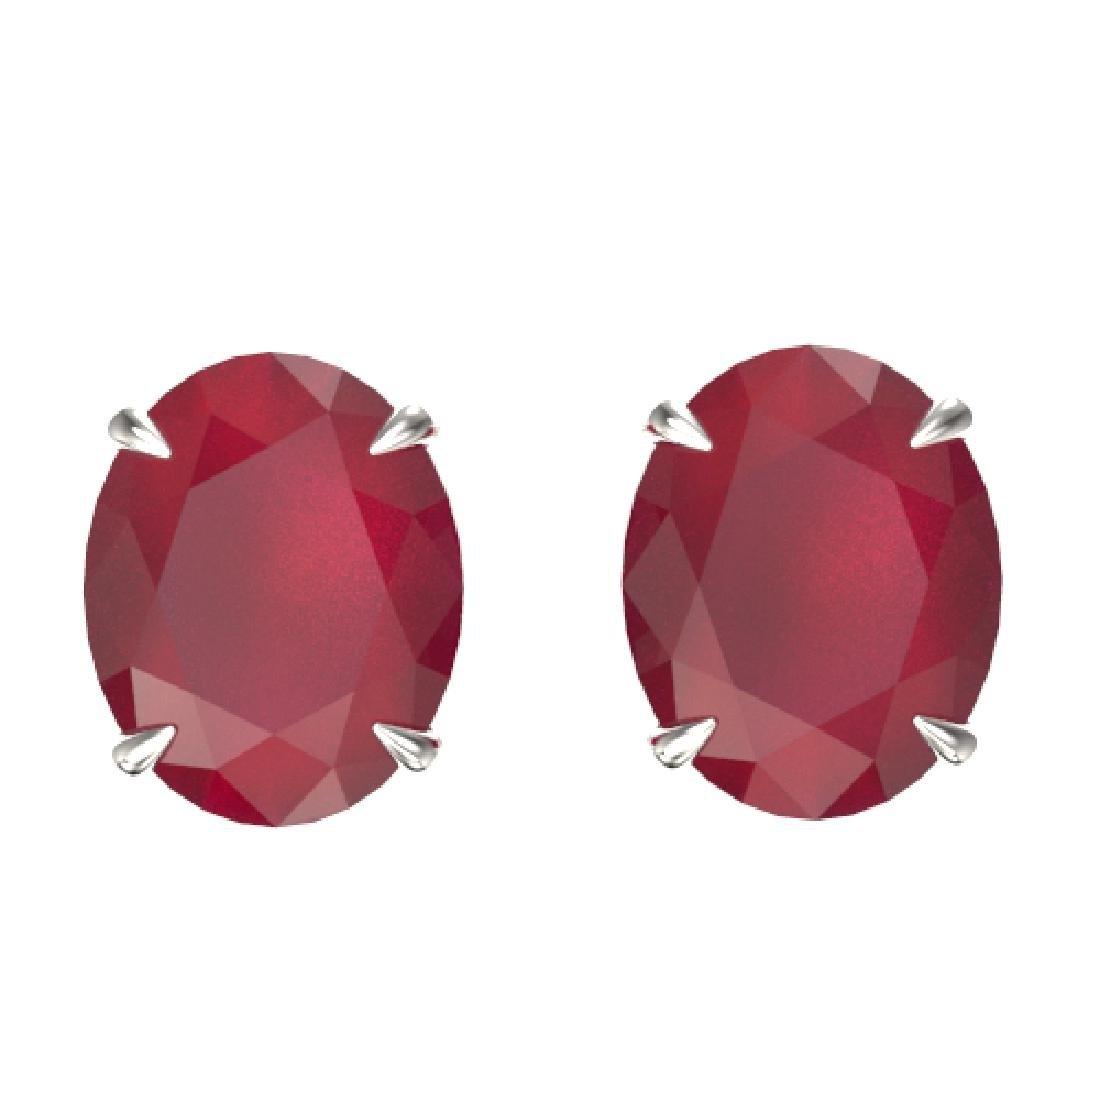 7 CTW Ruby Designer Inspired Solitaire Stud Earrings